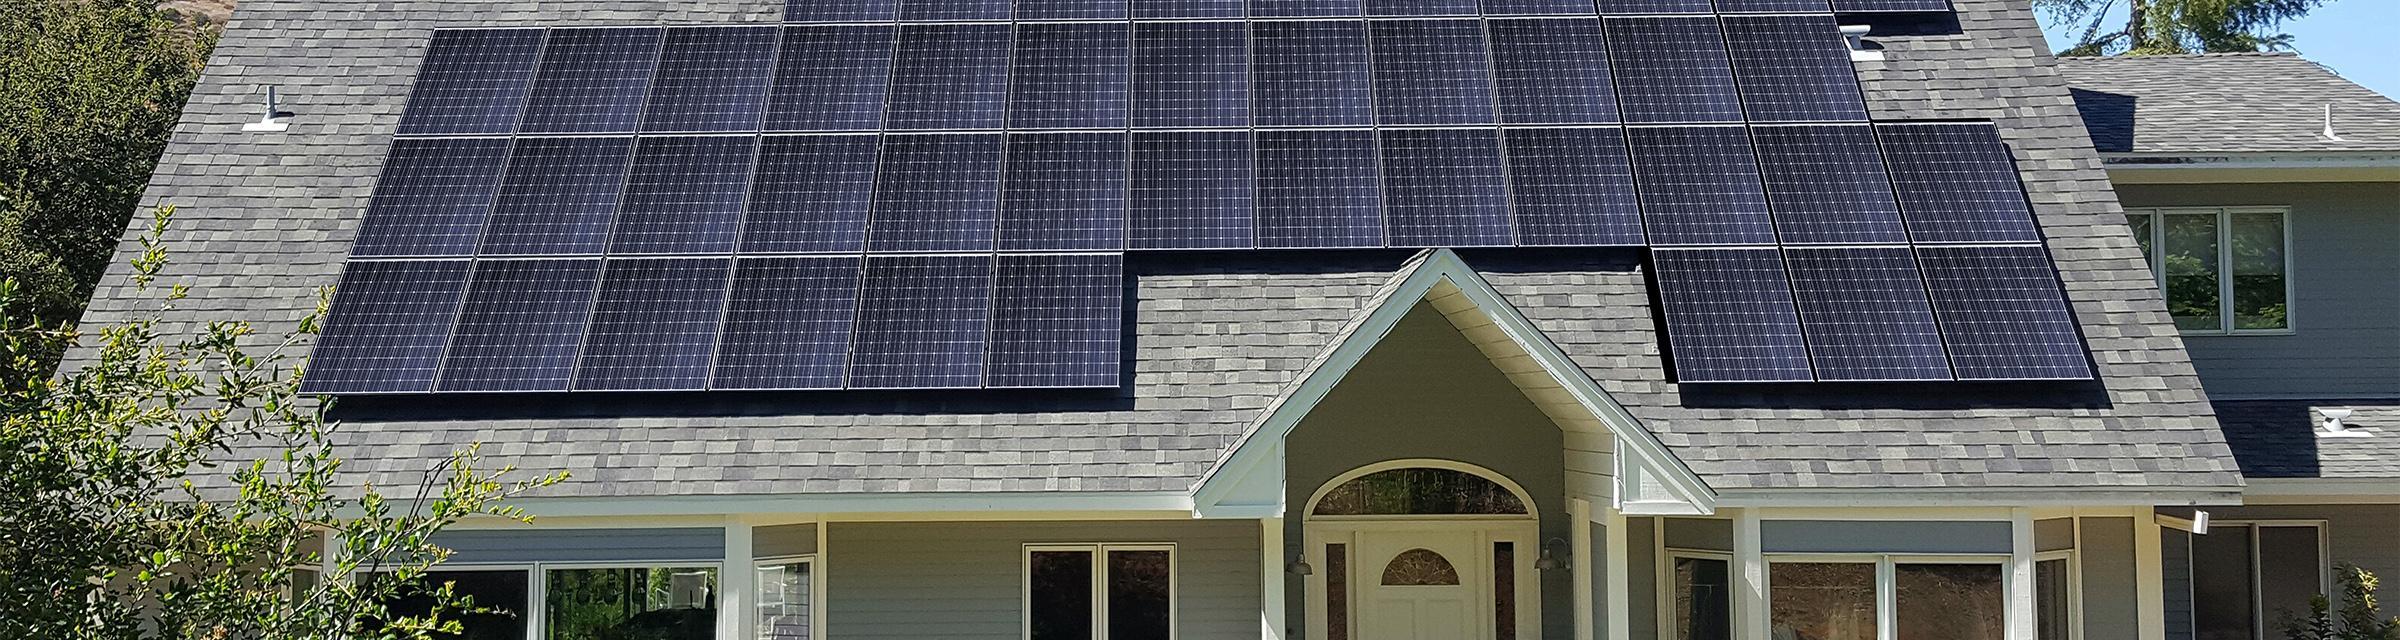 Panasonic Solar Energy System